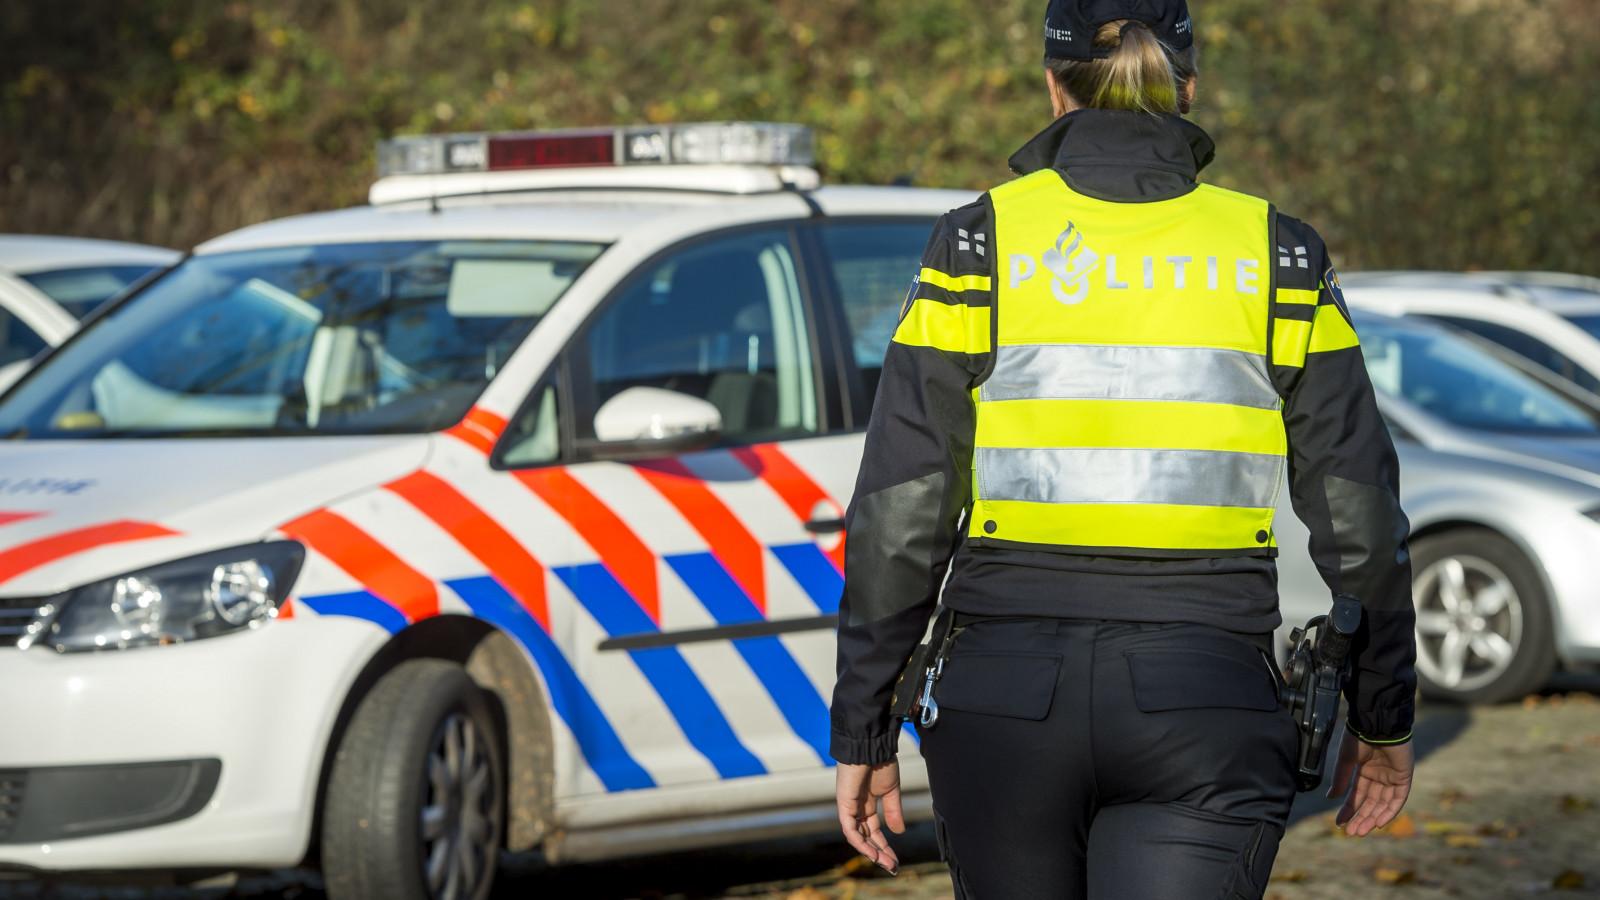 ANP / Lex van Lieshout